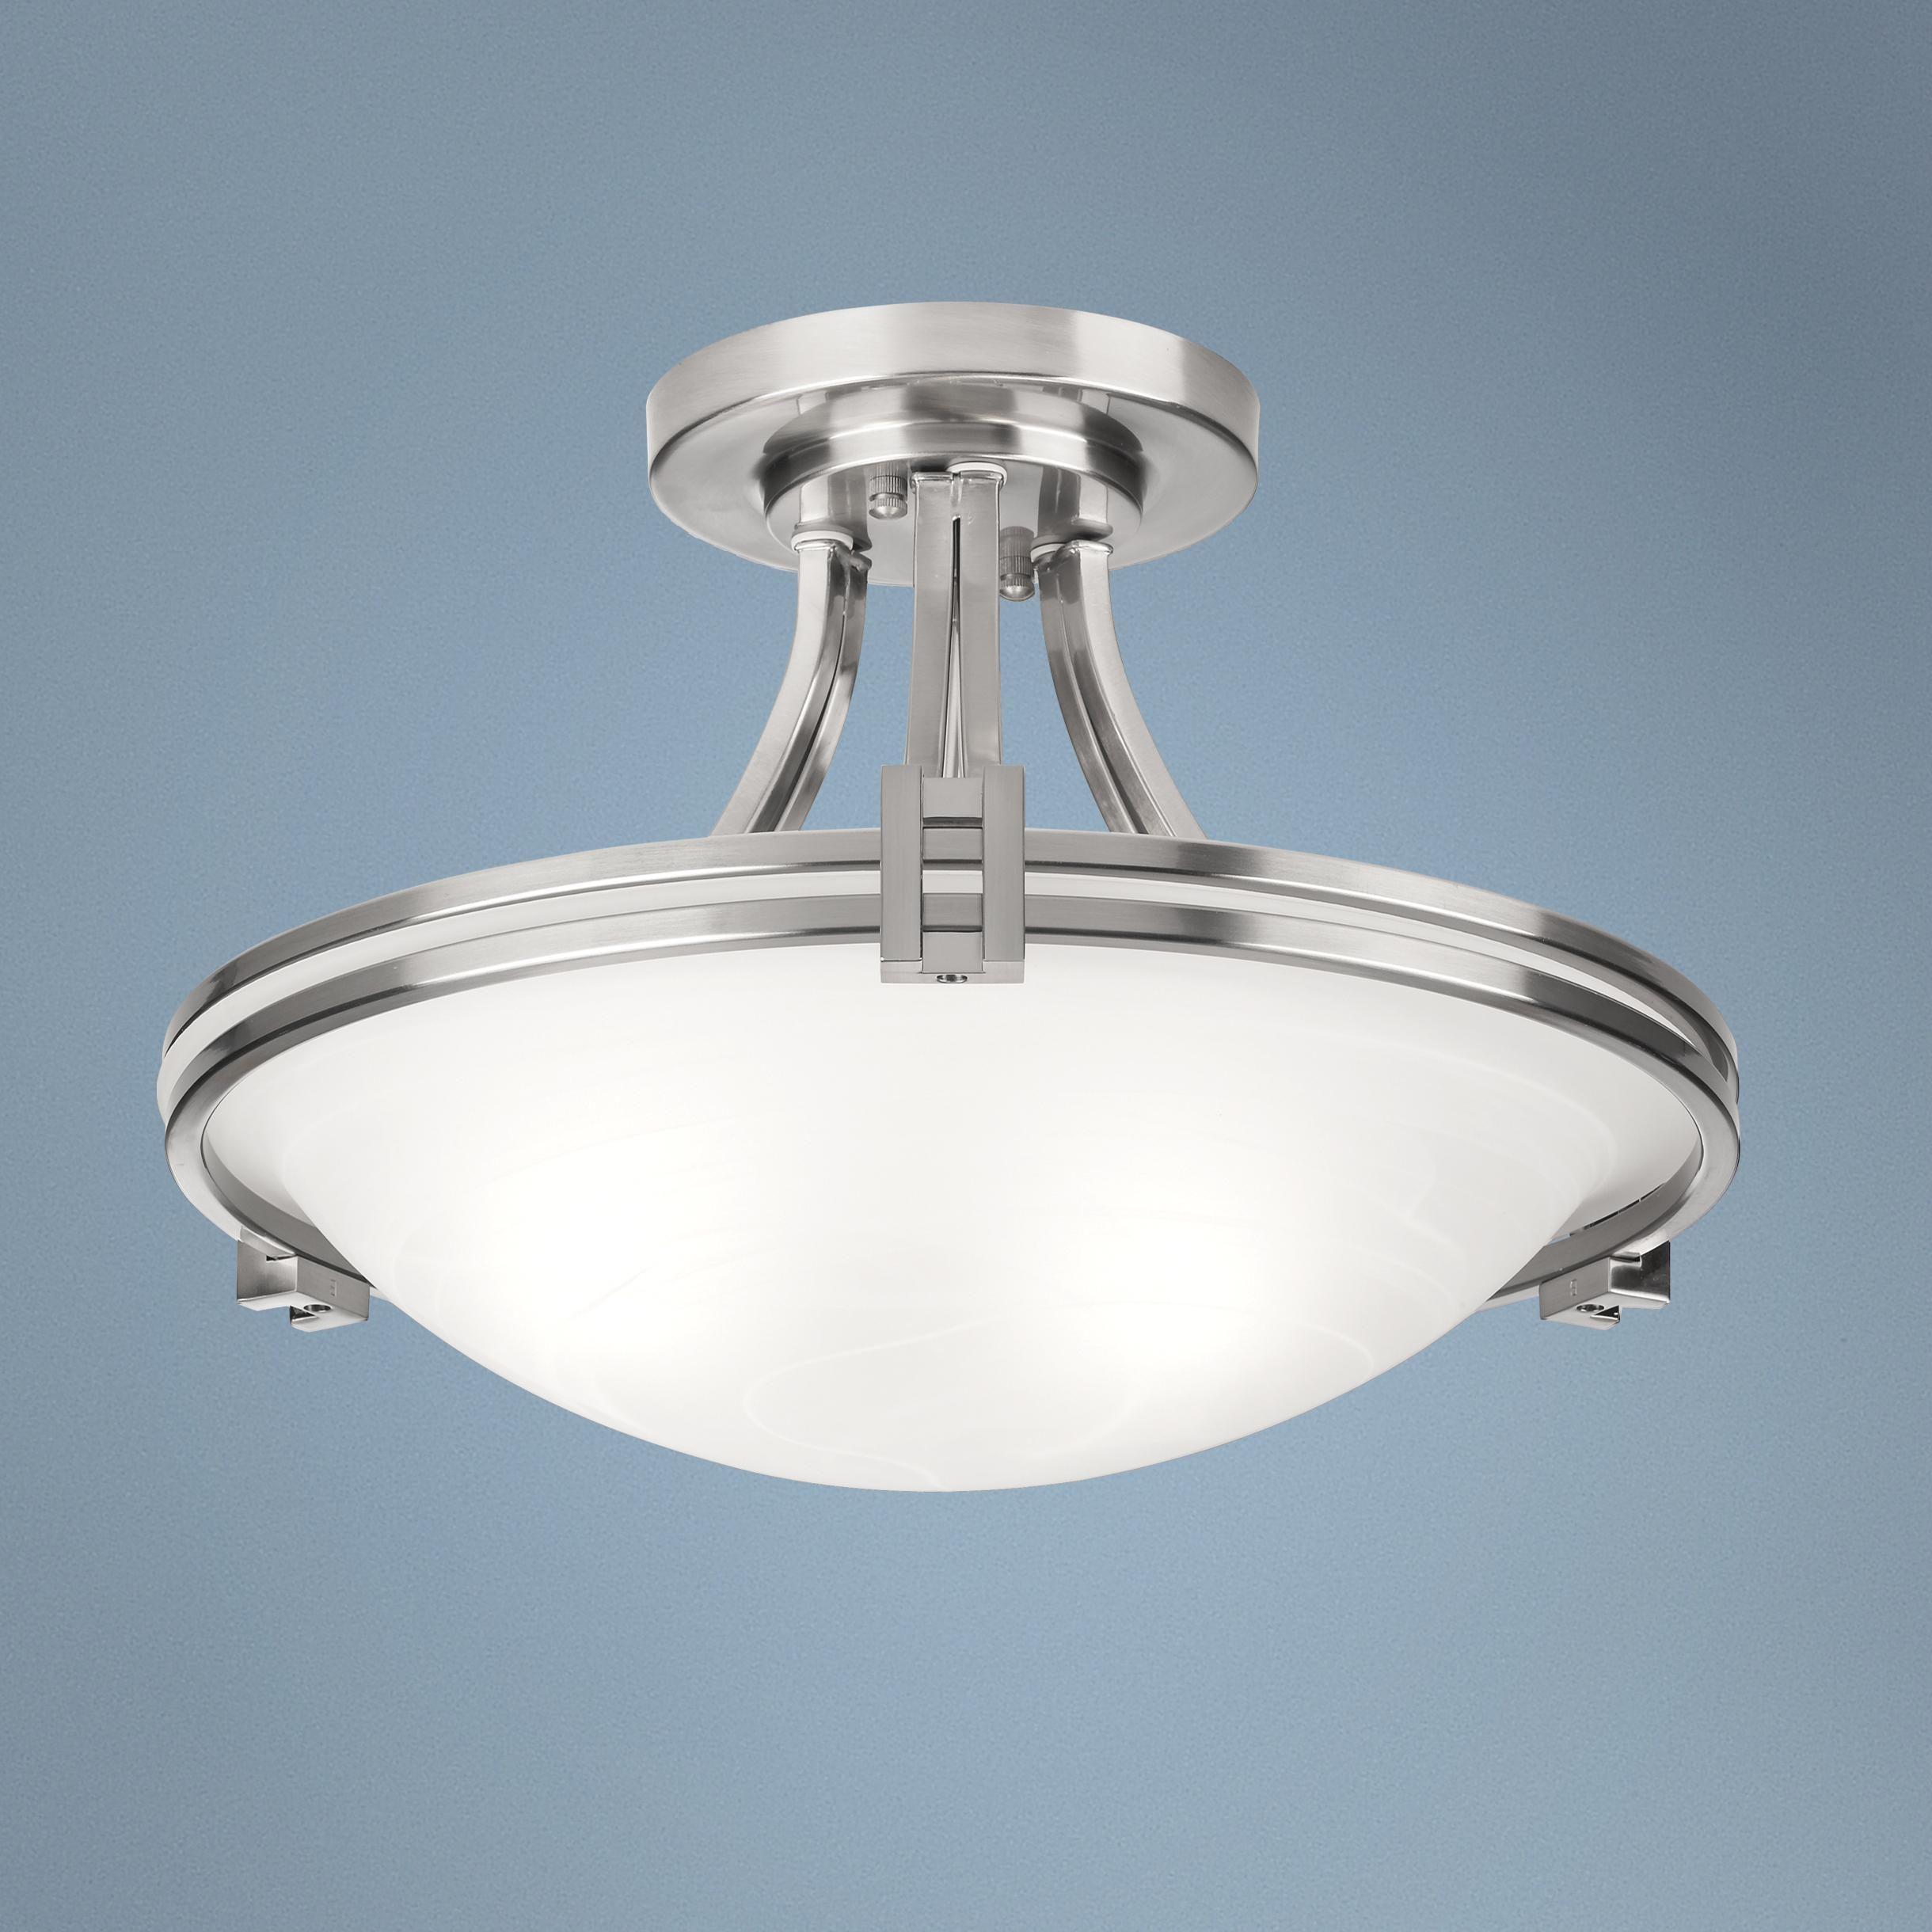 "Possini Euro Deco 16"" Wide Brushed Nickel Ceiling Light"